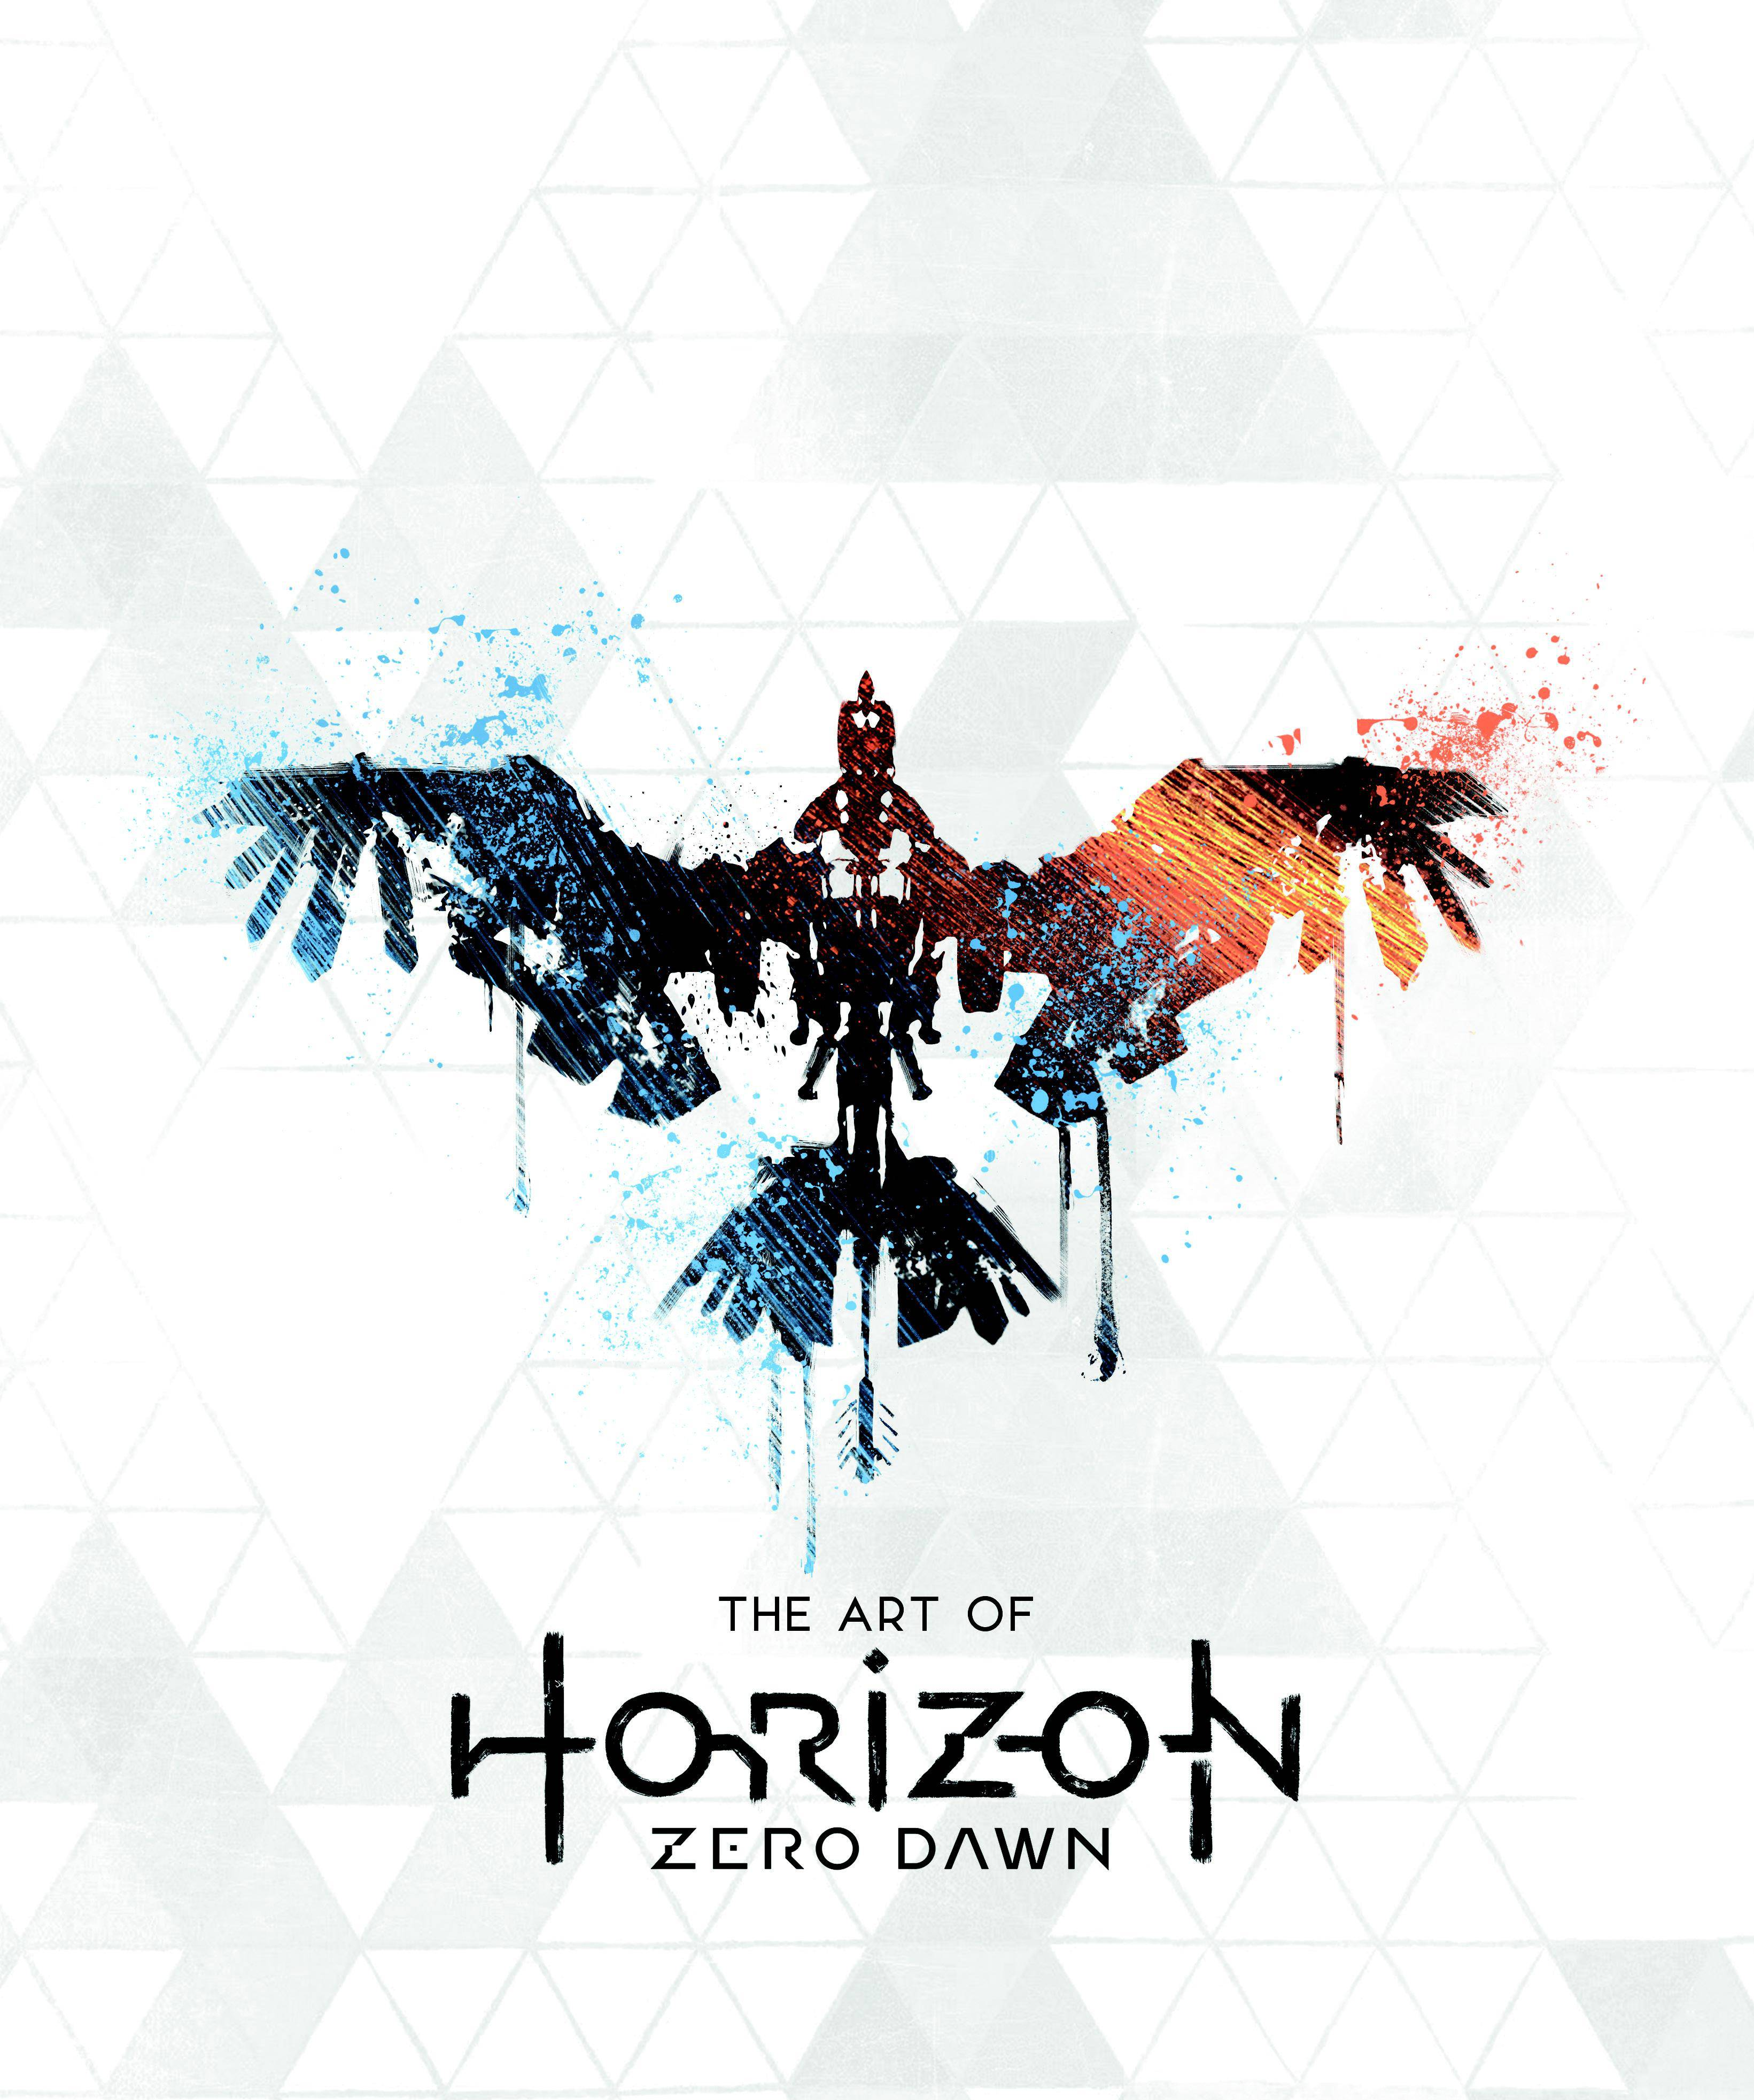 Horizon Zero Dawn Artwork Wallpaper